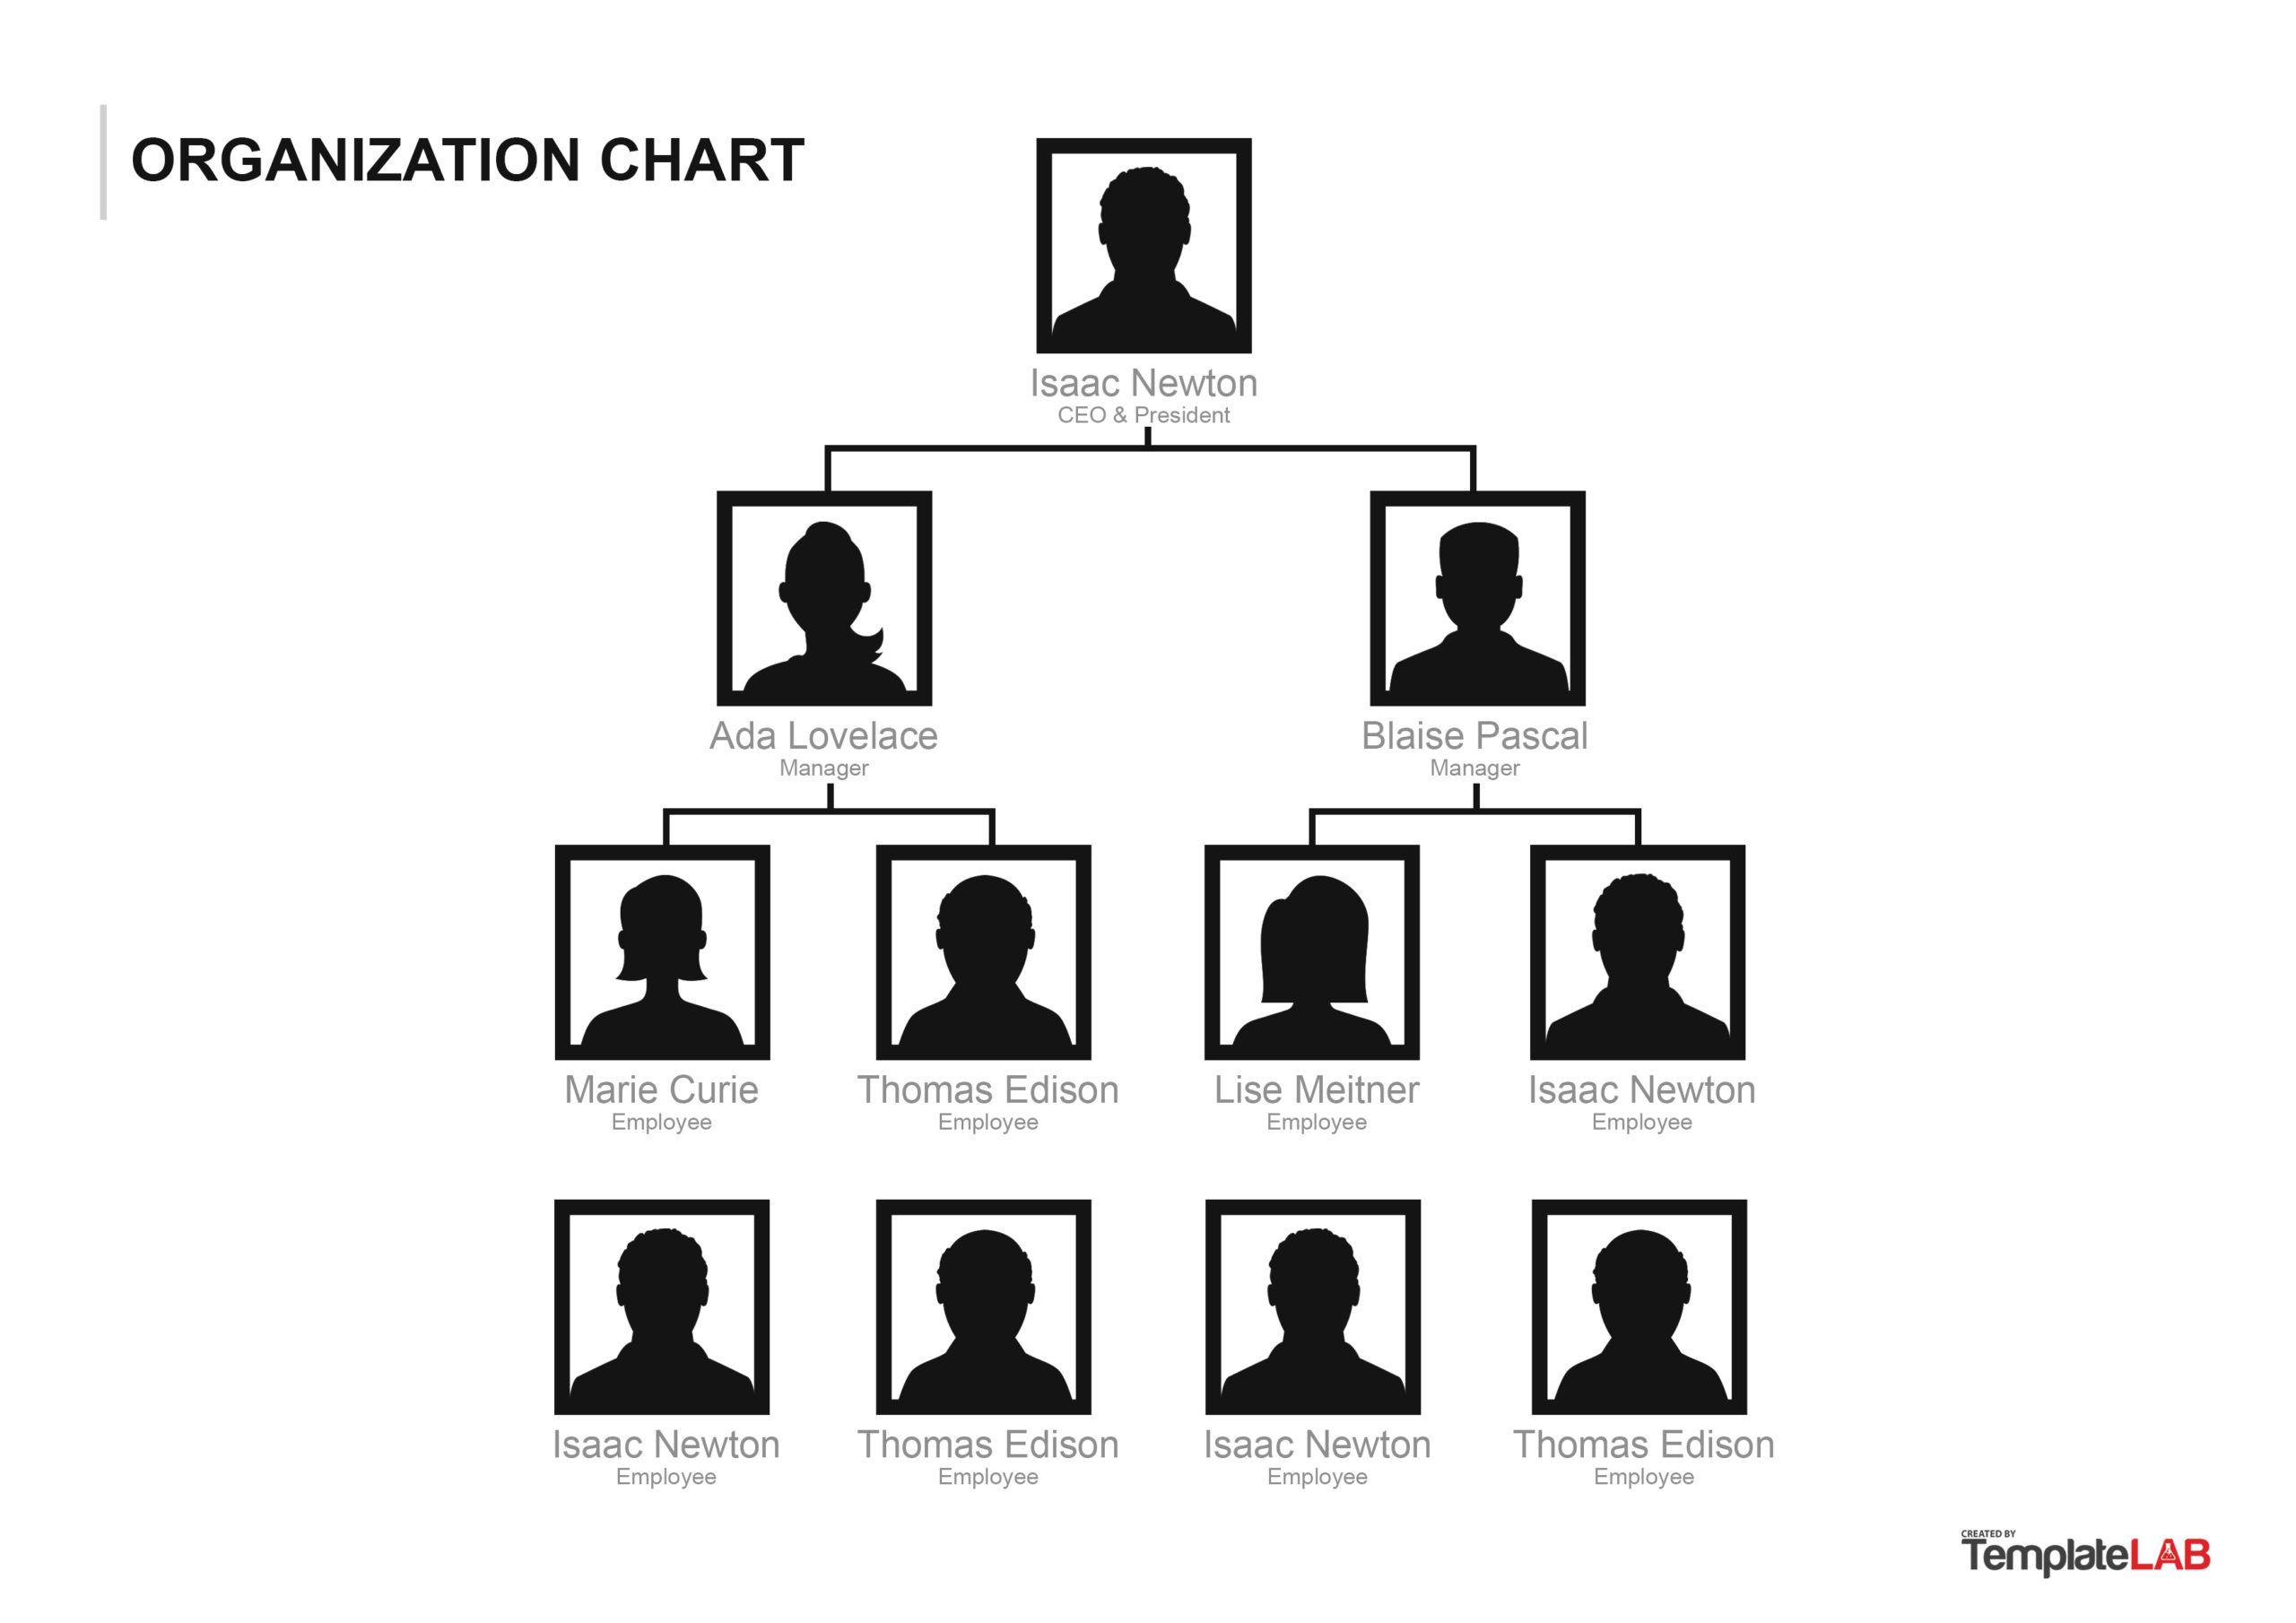 010 Best Microsoft Organizational Chart Template Word Inspiration  Free 2013 HierarchyFull